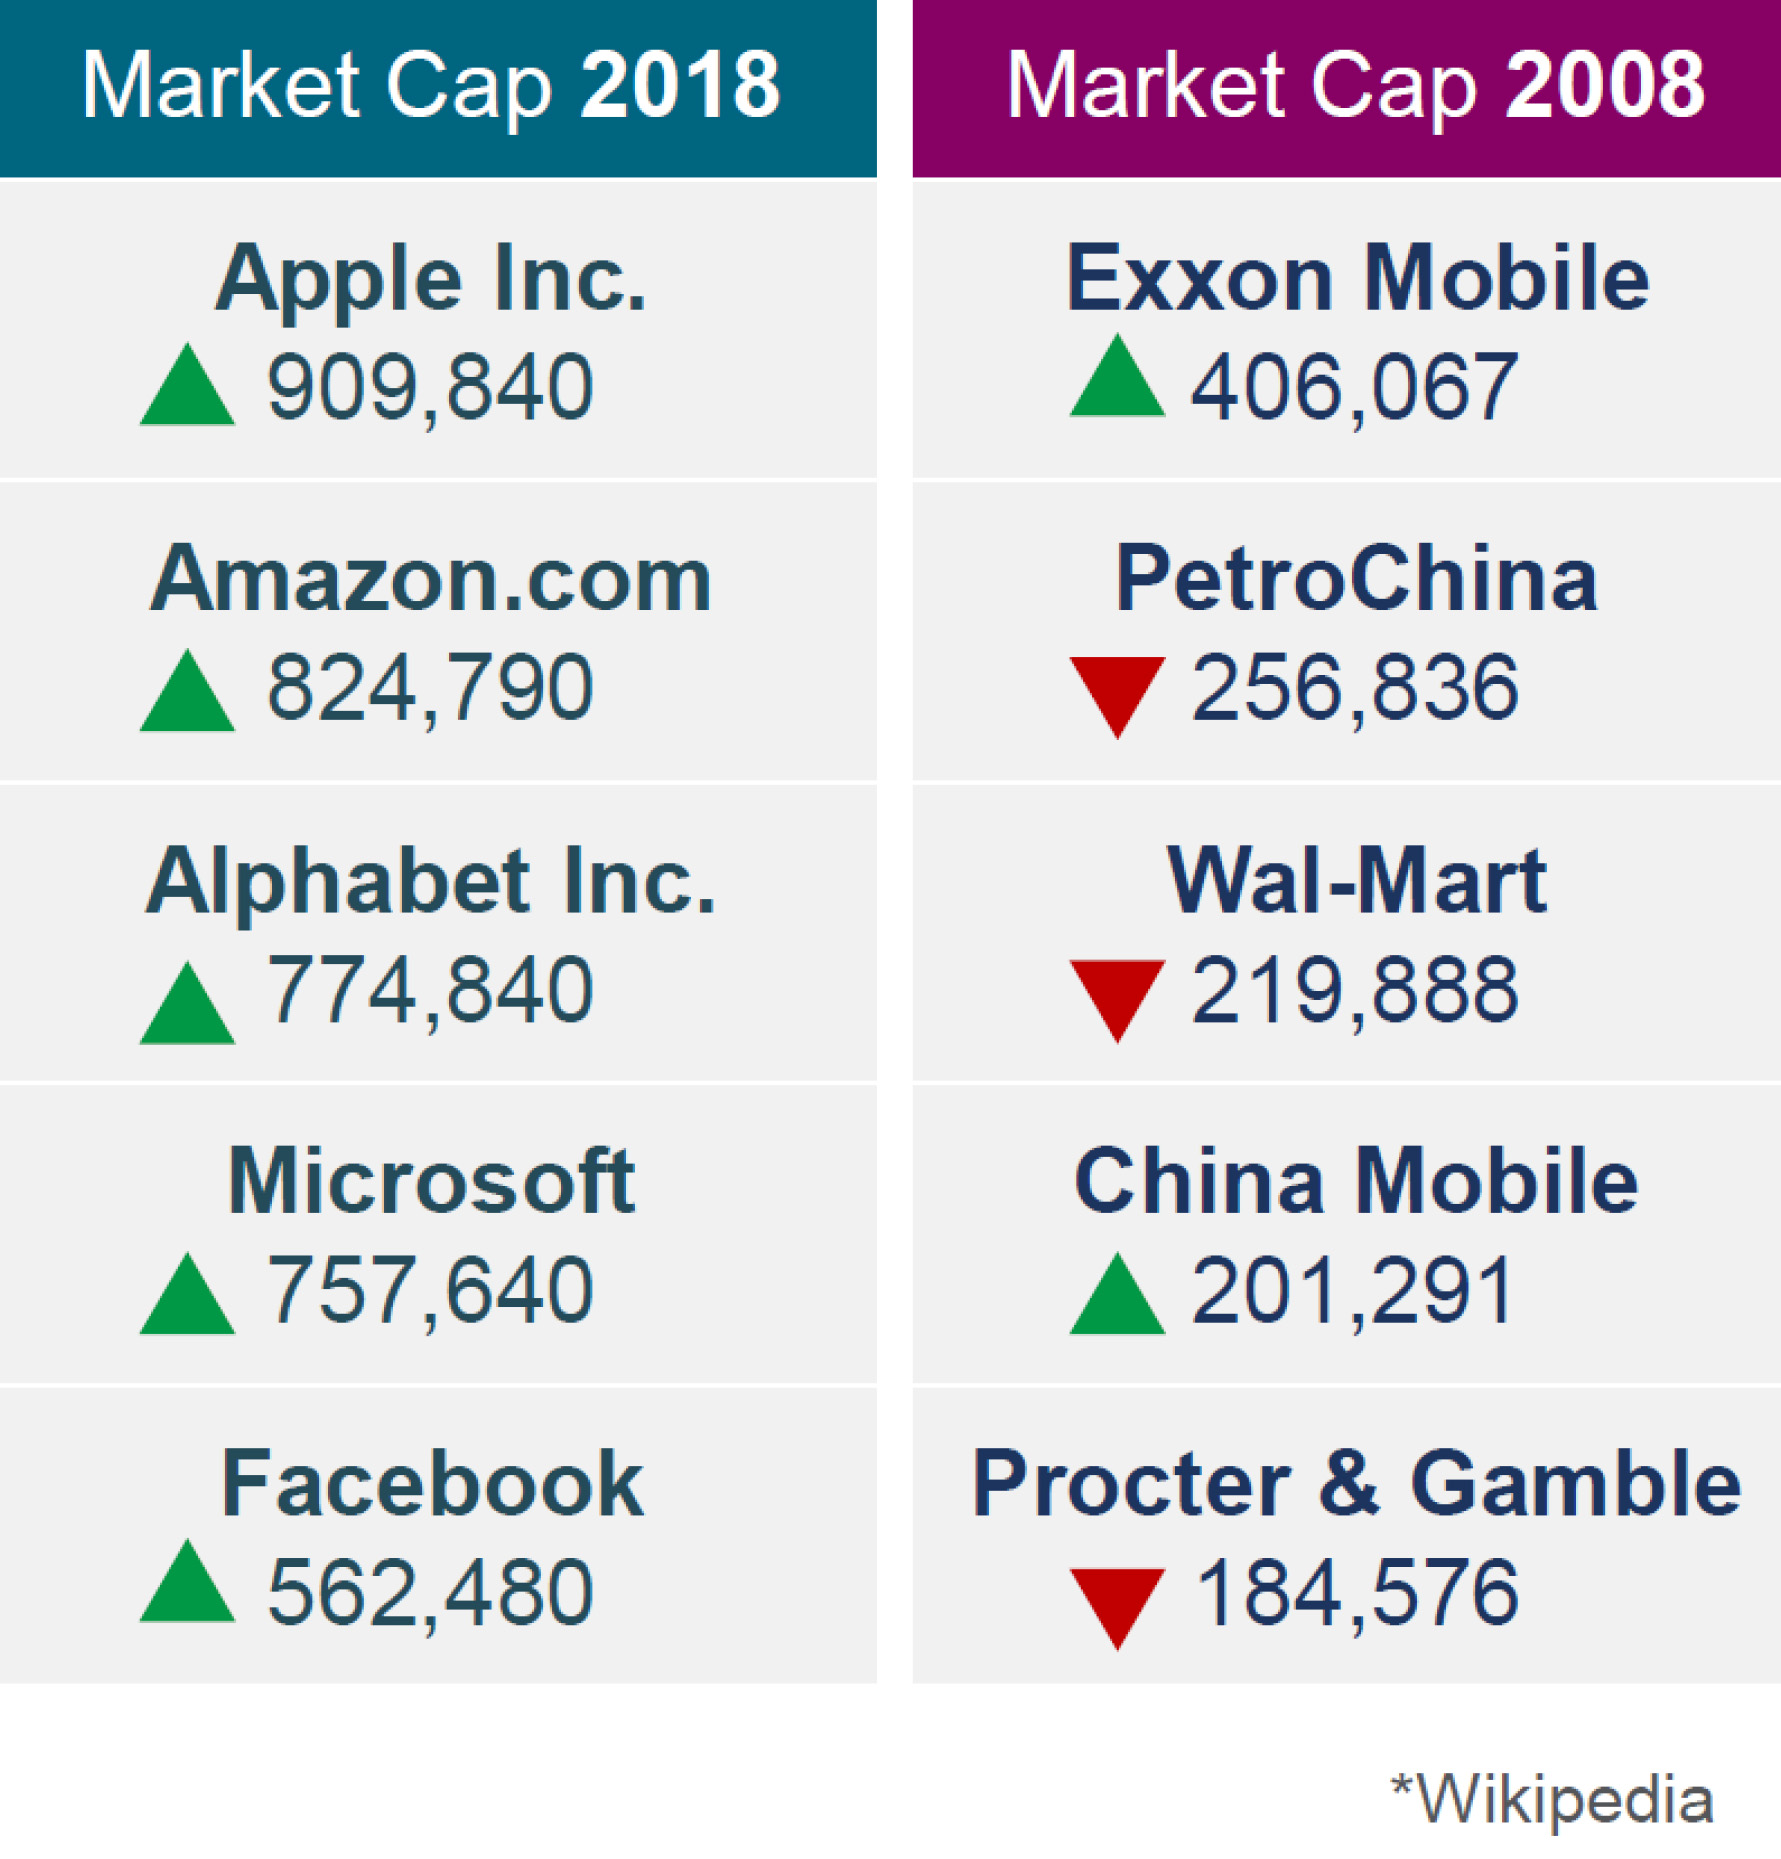 top companies by market cap